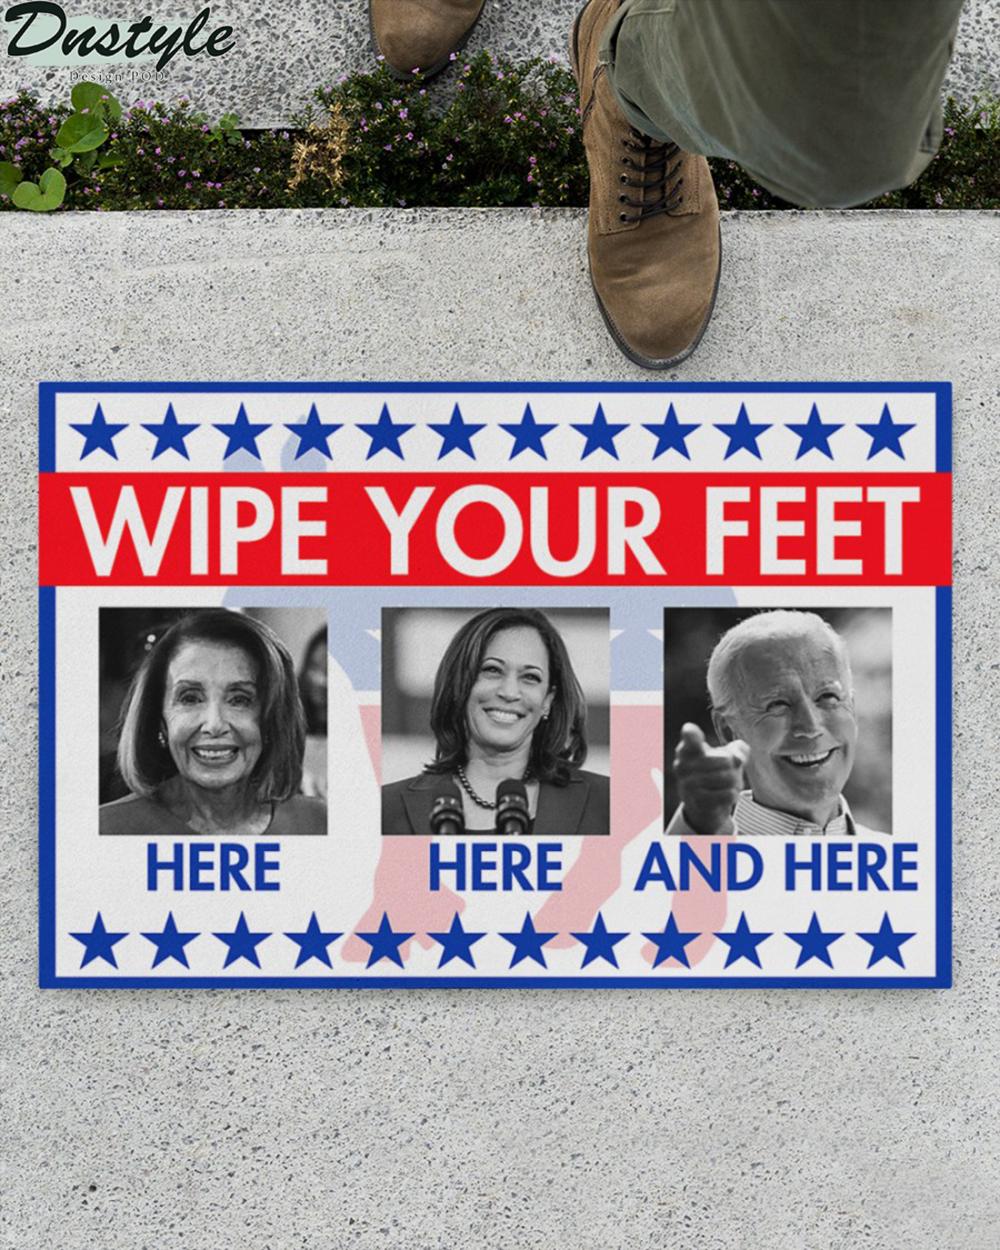 Biden and Kamala Harris wipe your feet here here and here doormat 1